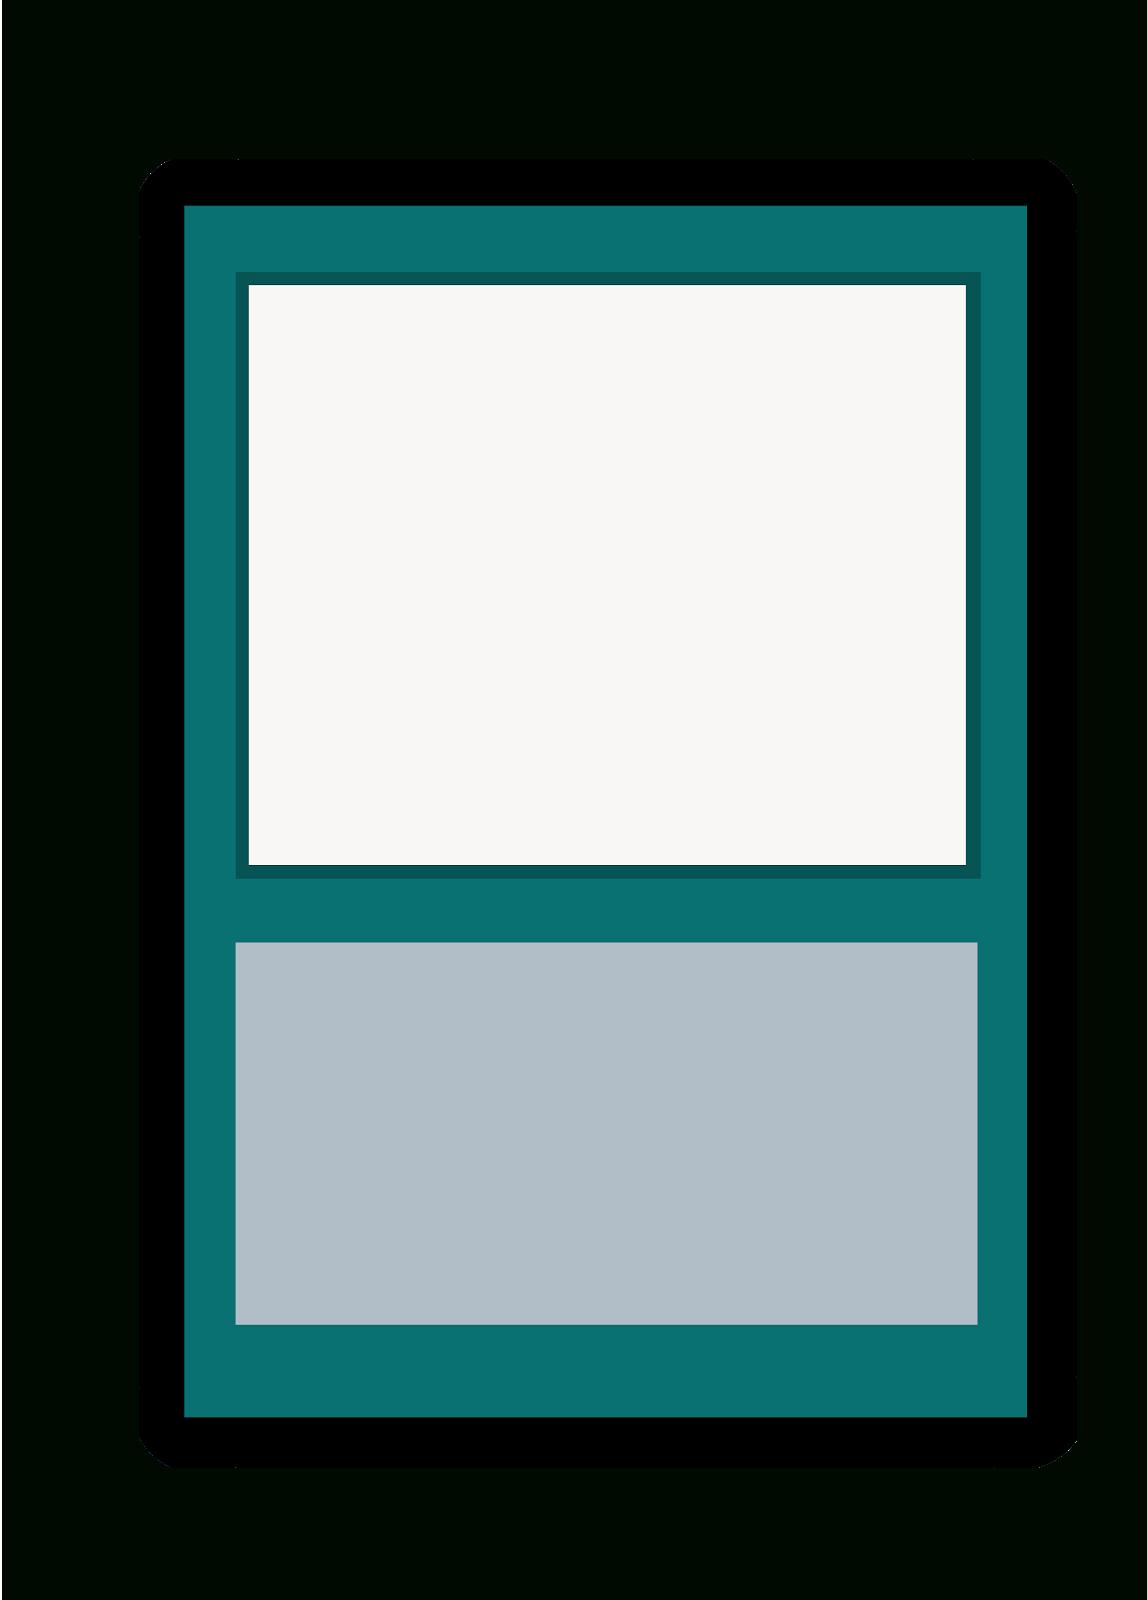 8.bit.love.child: Blank Magic: The Gathering Card Template Regarding Blank Magic Card Template